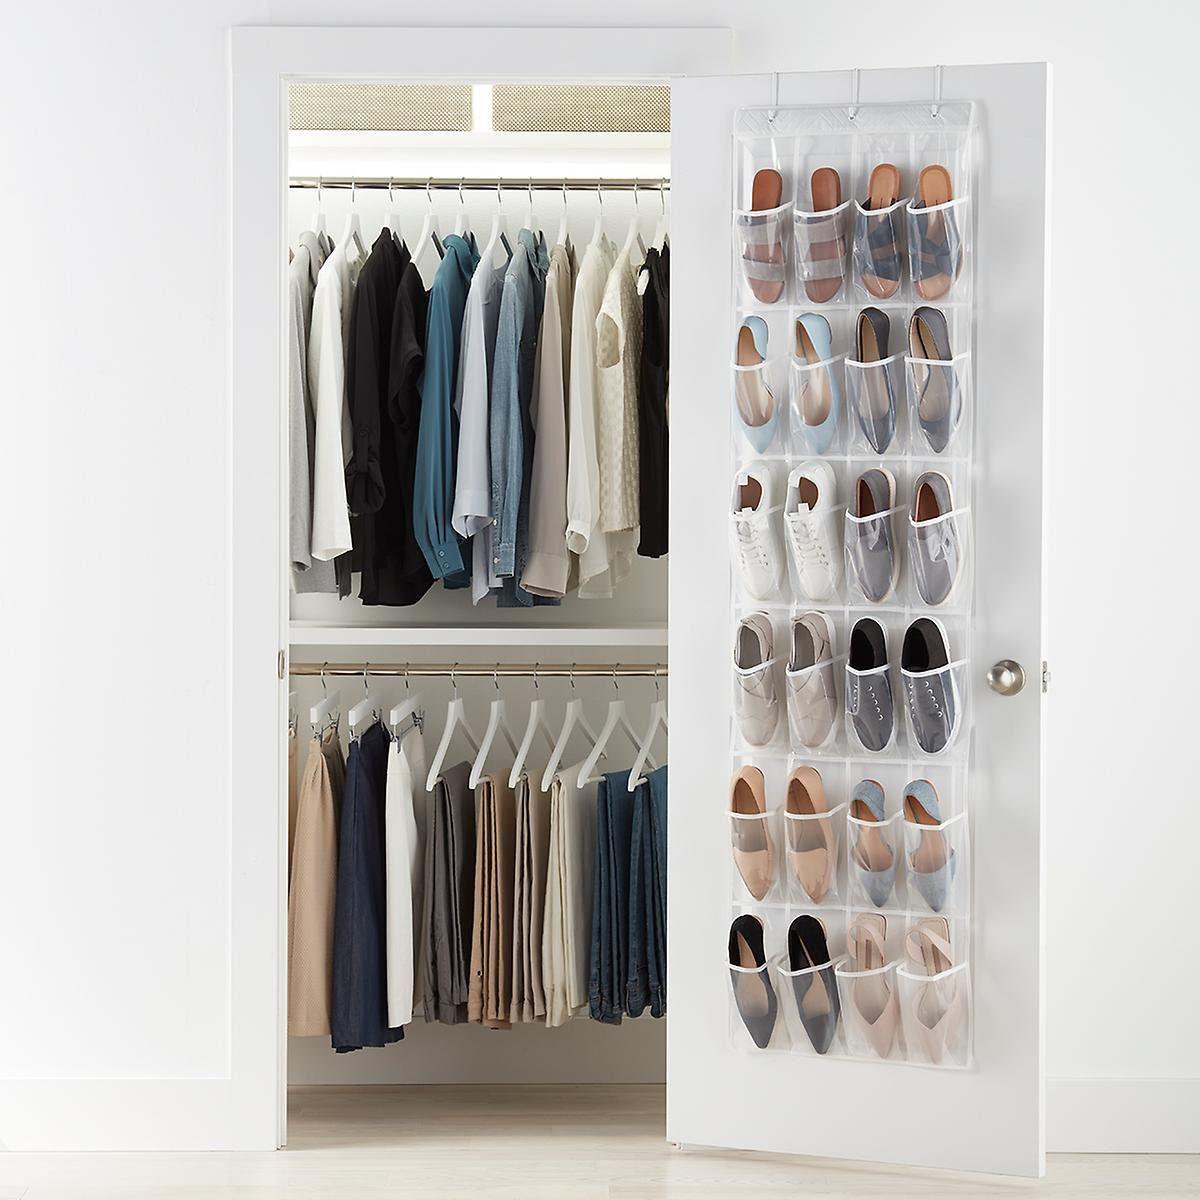 Door to a closet with an organizer hanging on the door.